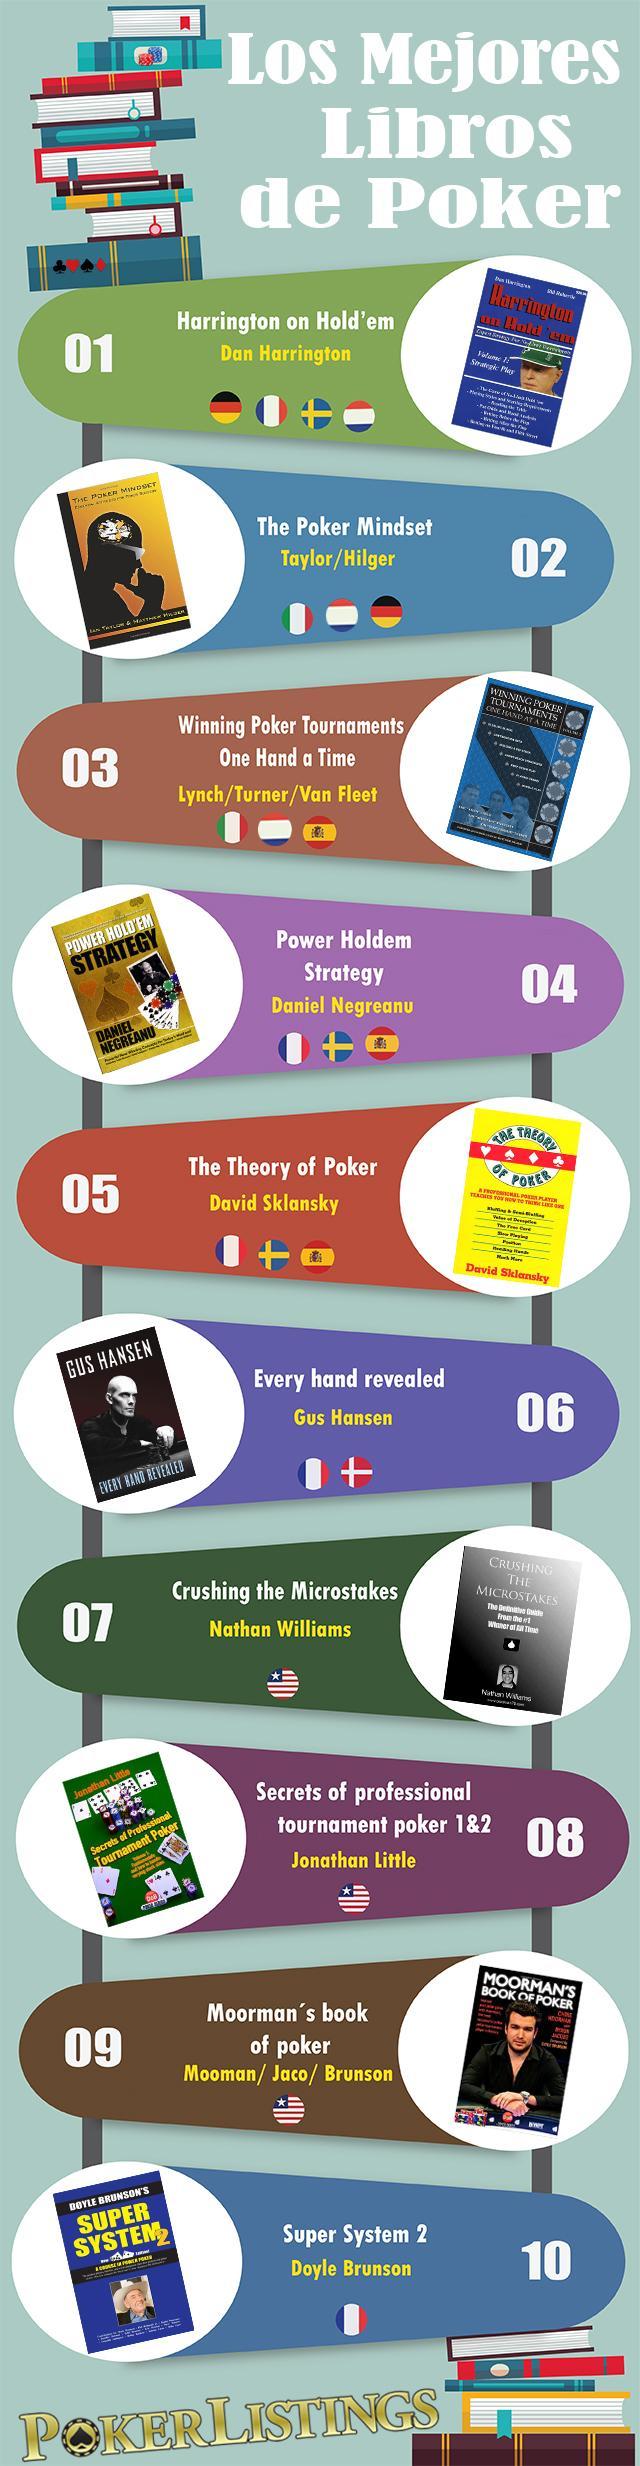 mejores libros poker